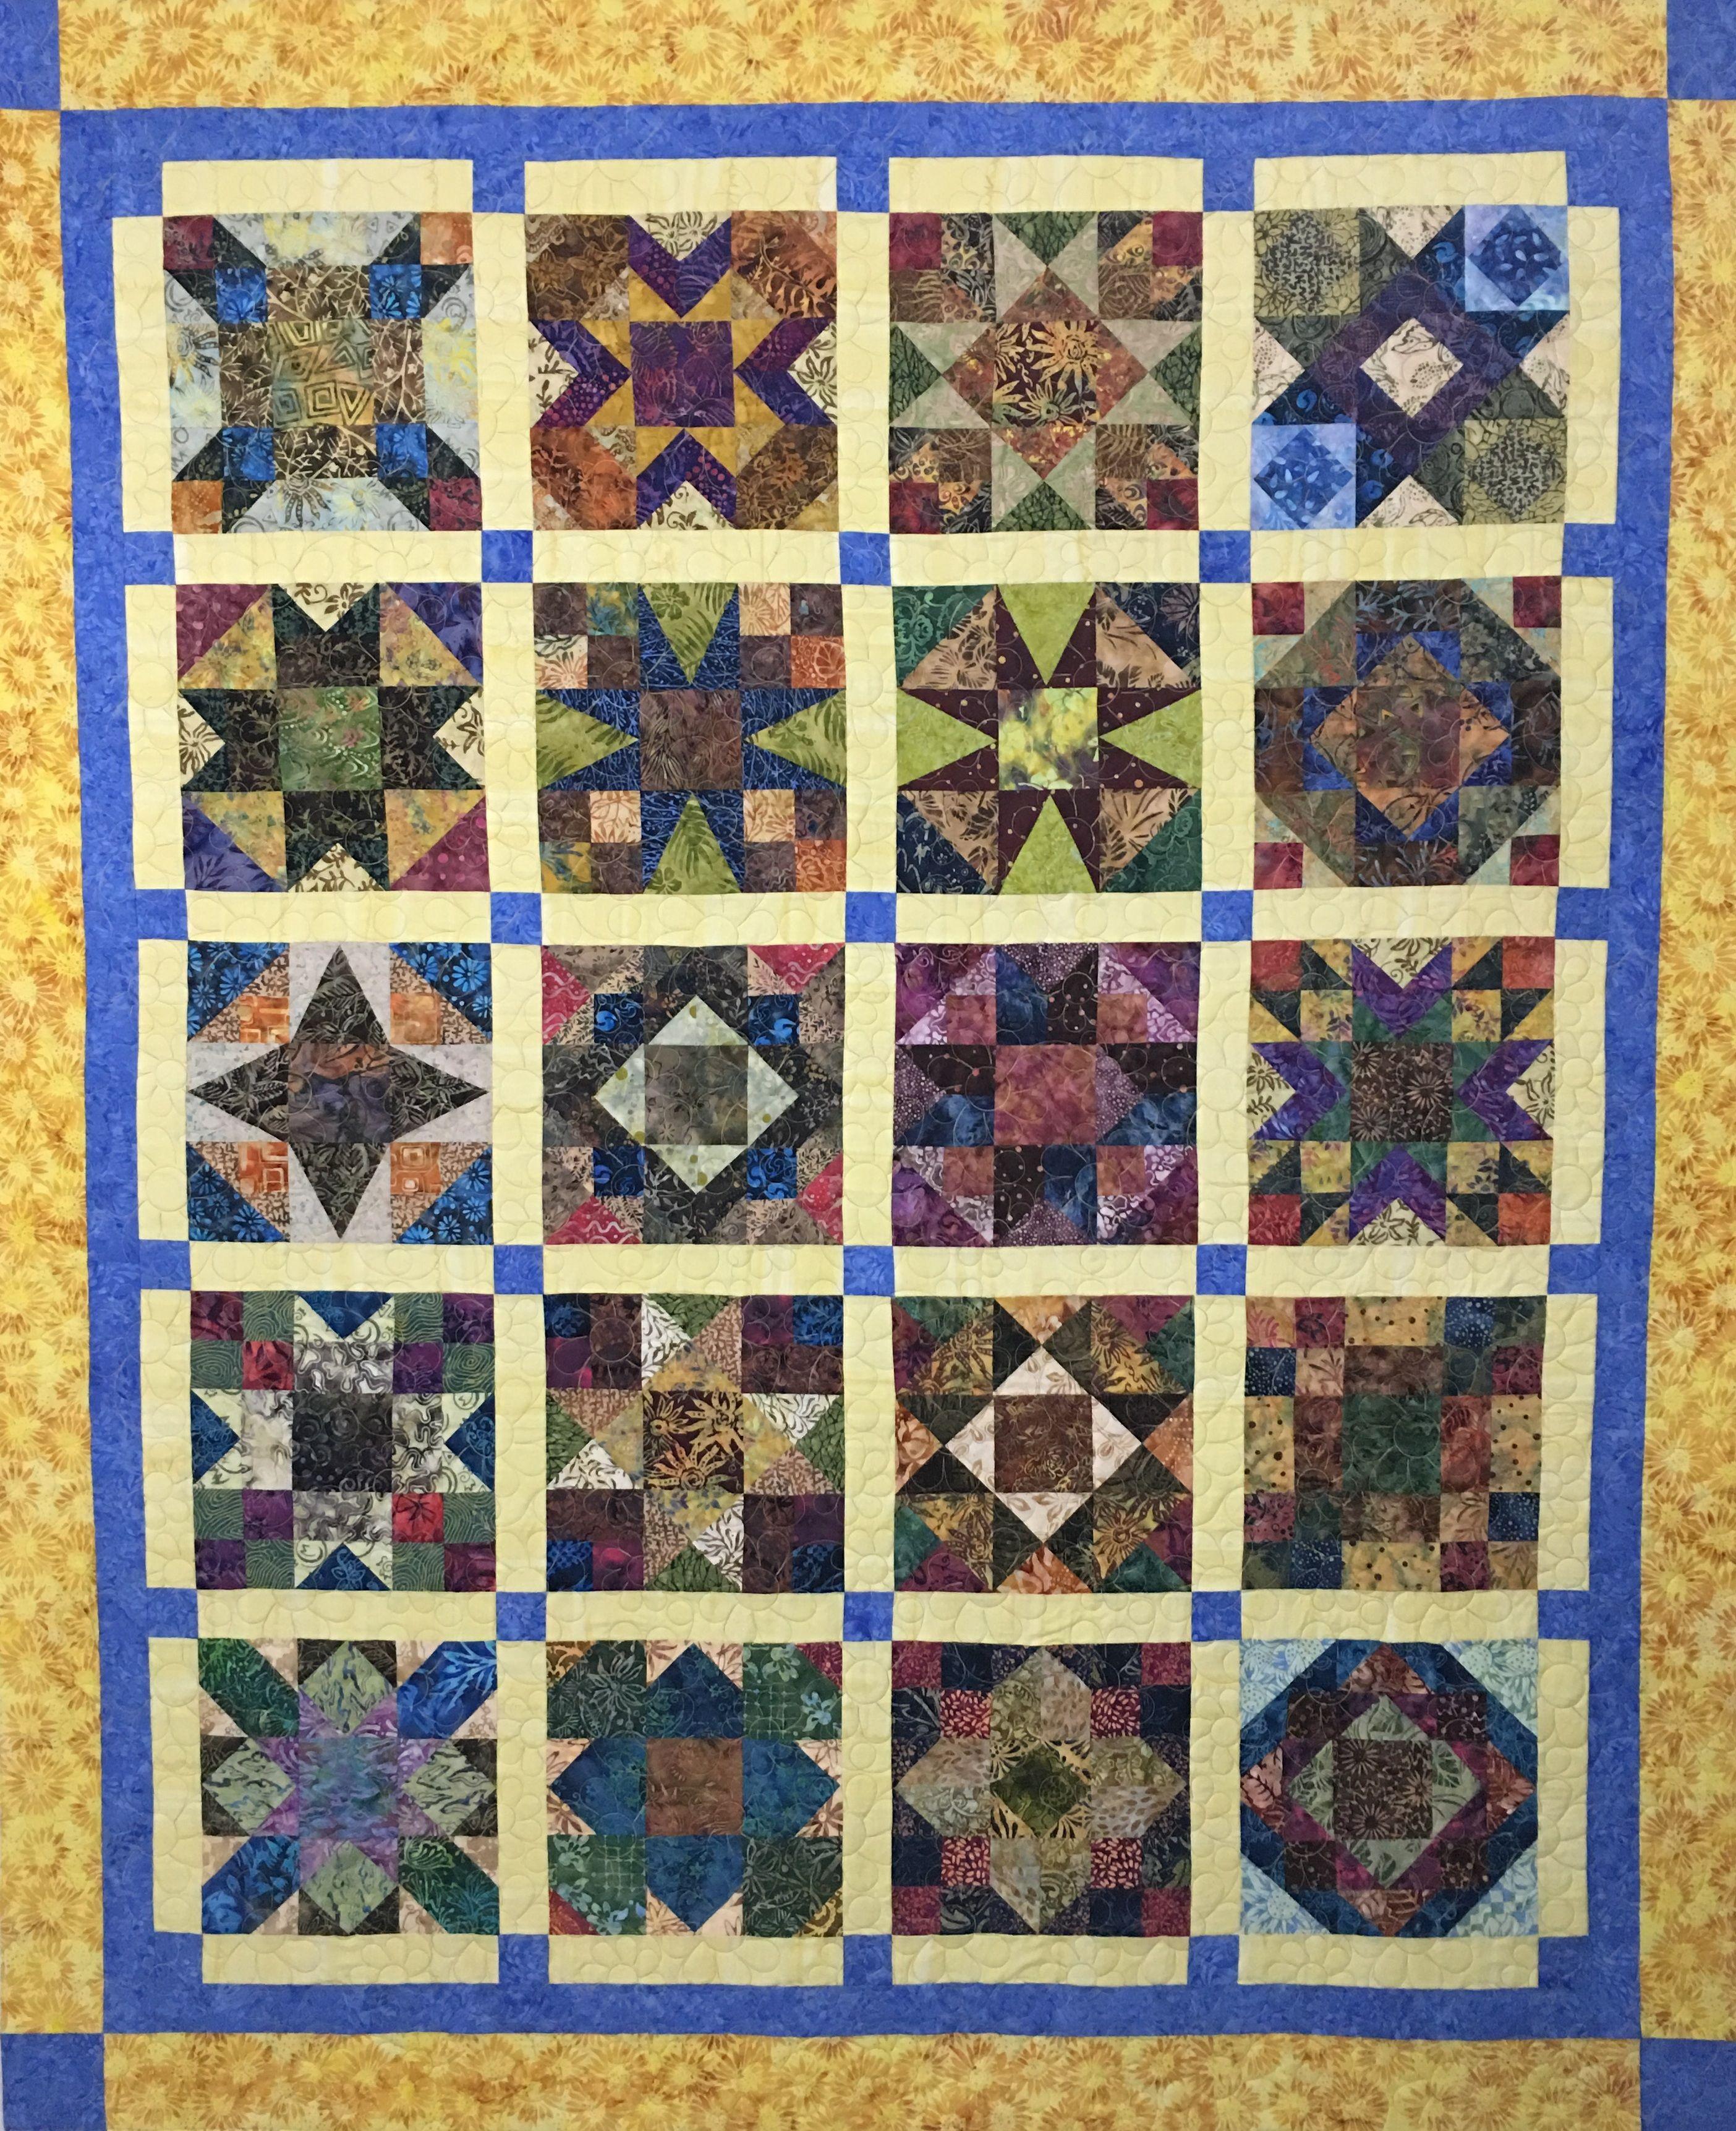 Jocelyn Robinson Quilt Club Sizzie Quilt   Star Quilts   Pinterest ... : quilt club - Adamdwight.com